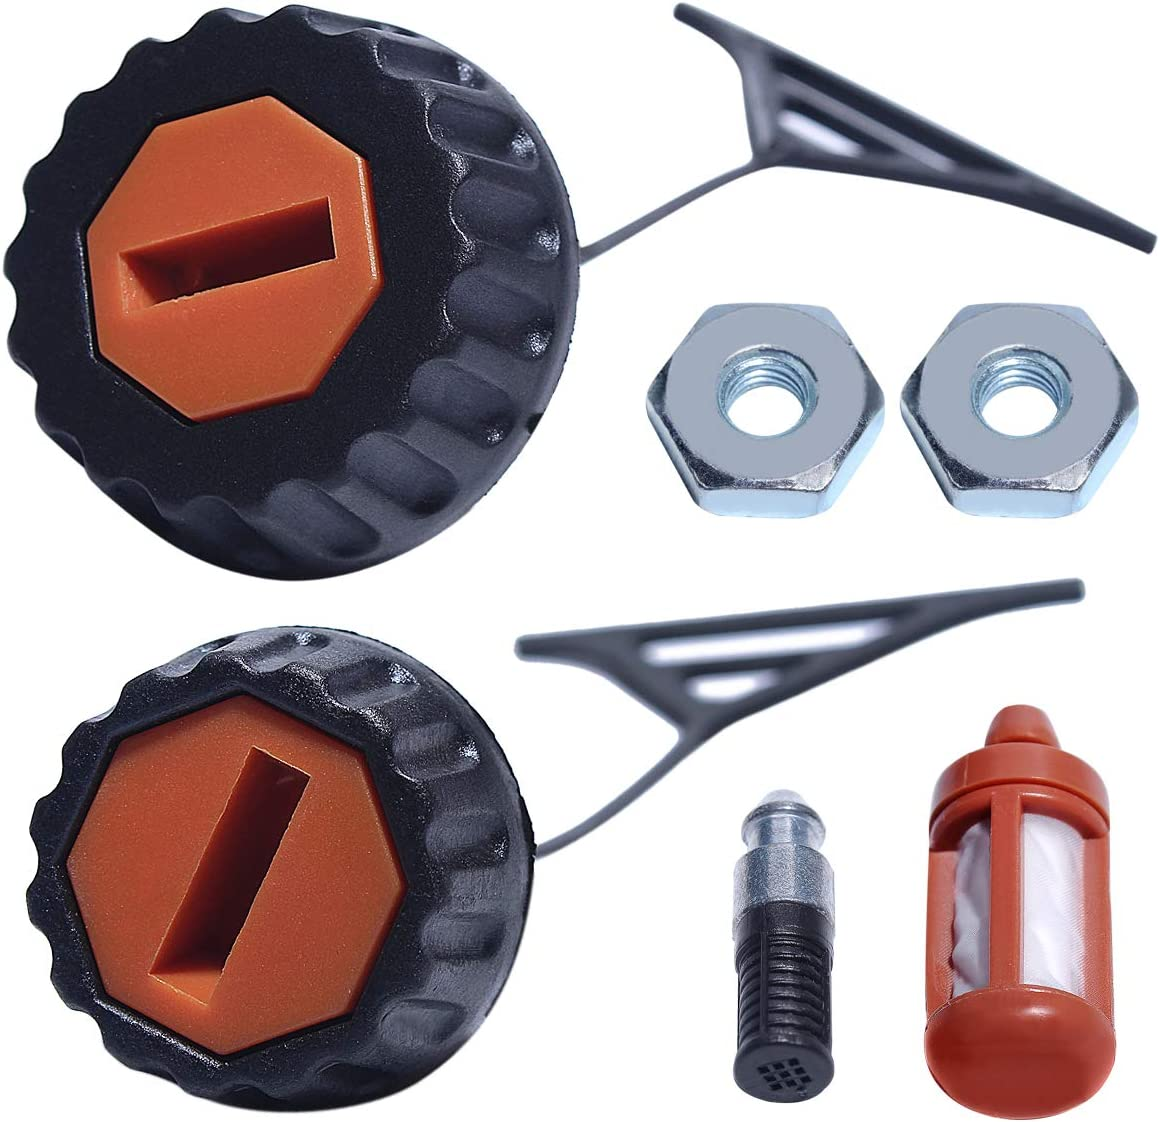 Fits 029 /& 039 Chainsaws STIHL Fuel /& Oil Cap